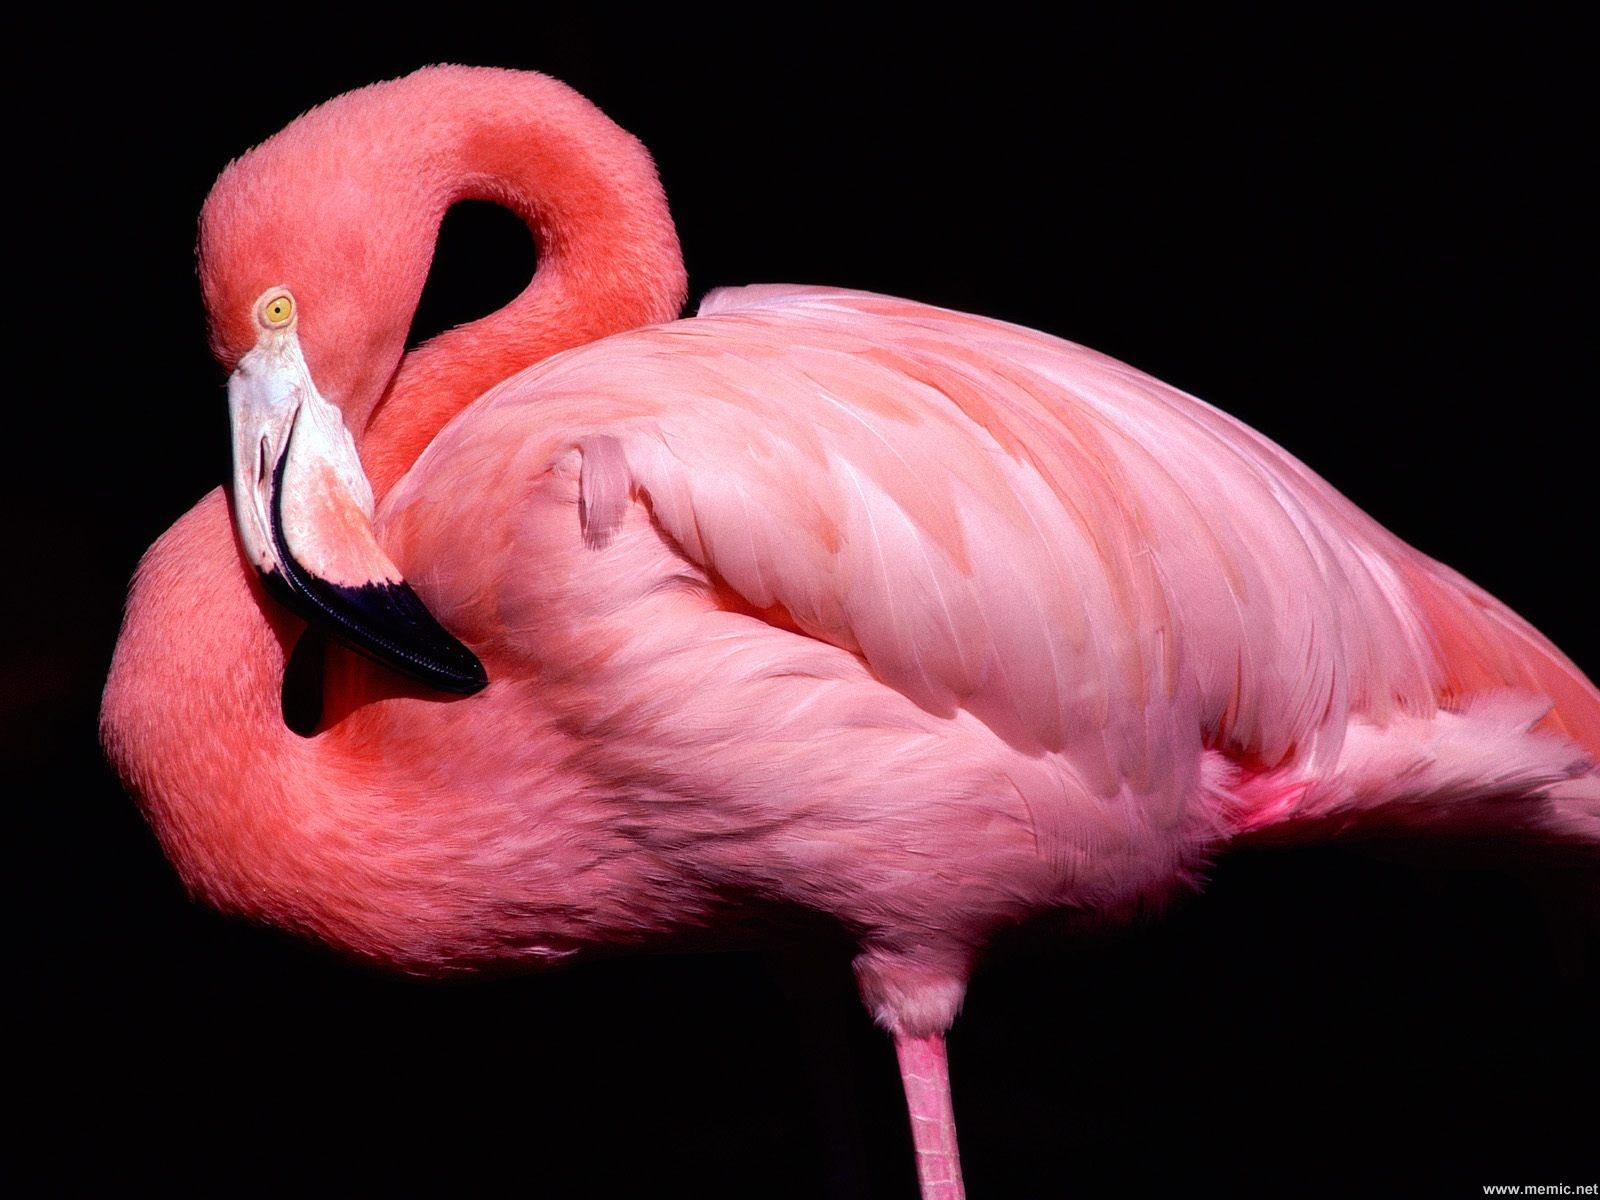 Fenicottero rosa ai Parioli